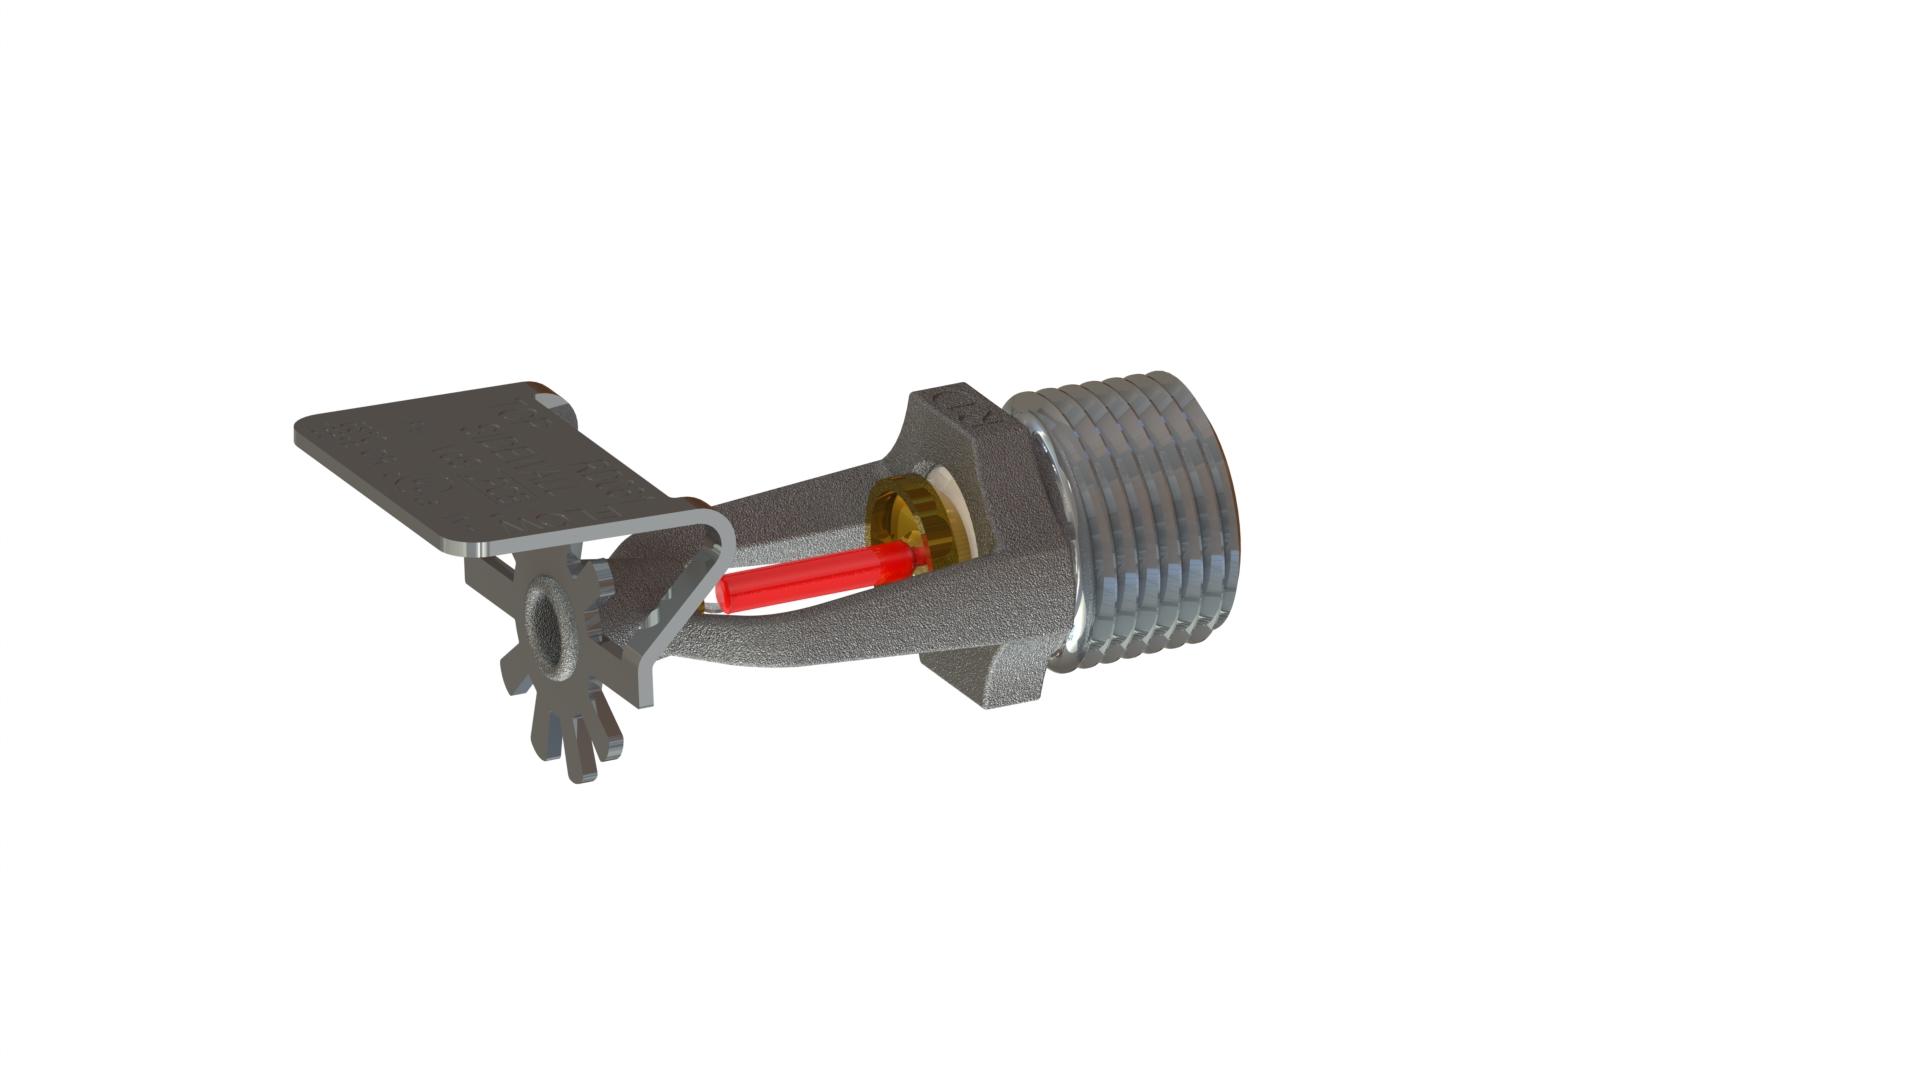 Rapidrop British Manufacturer Supplier Of Fire Sprinklers Fire